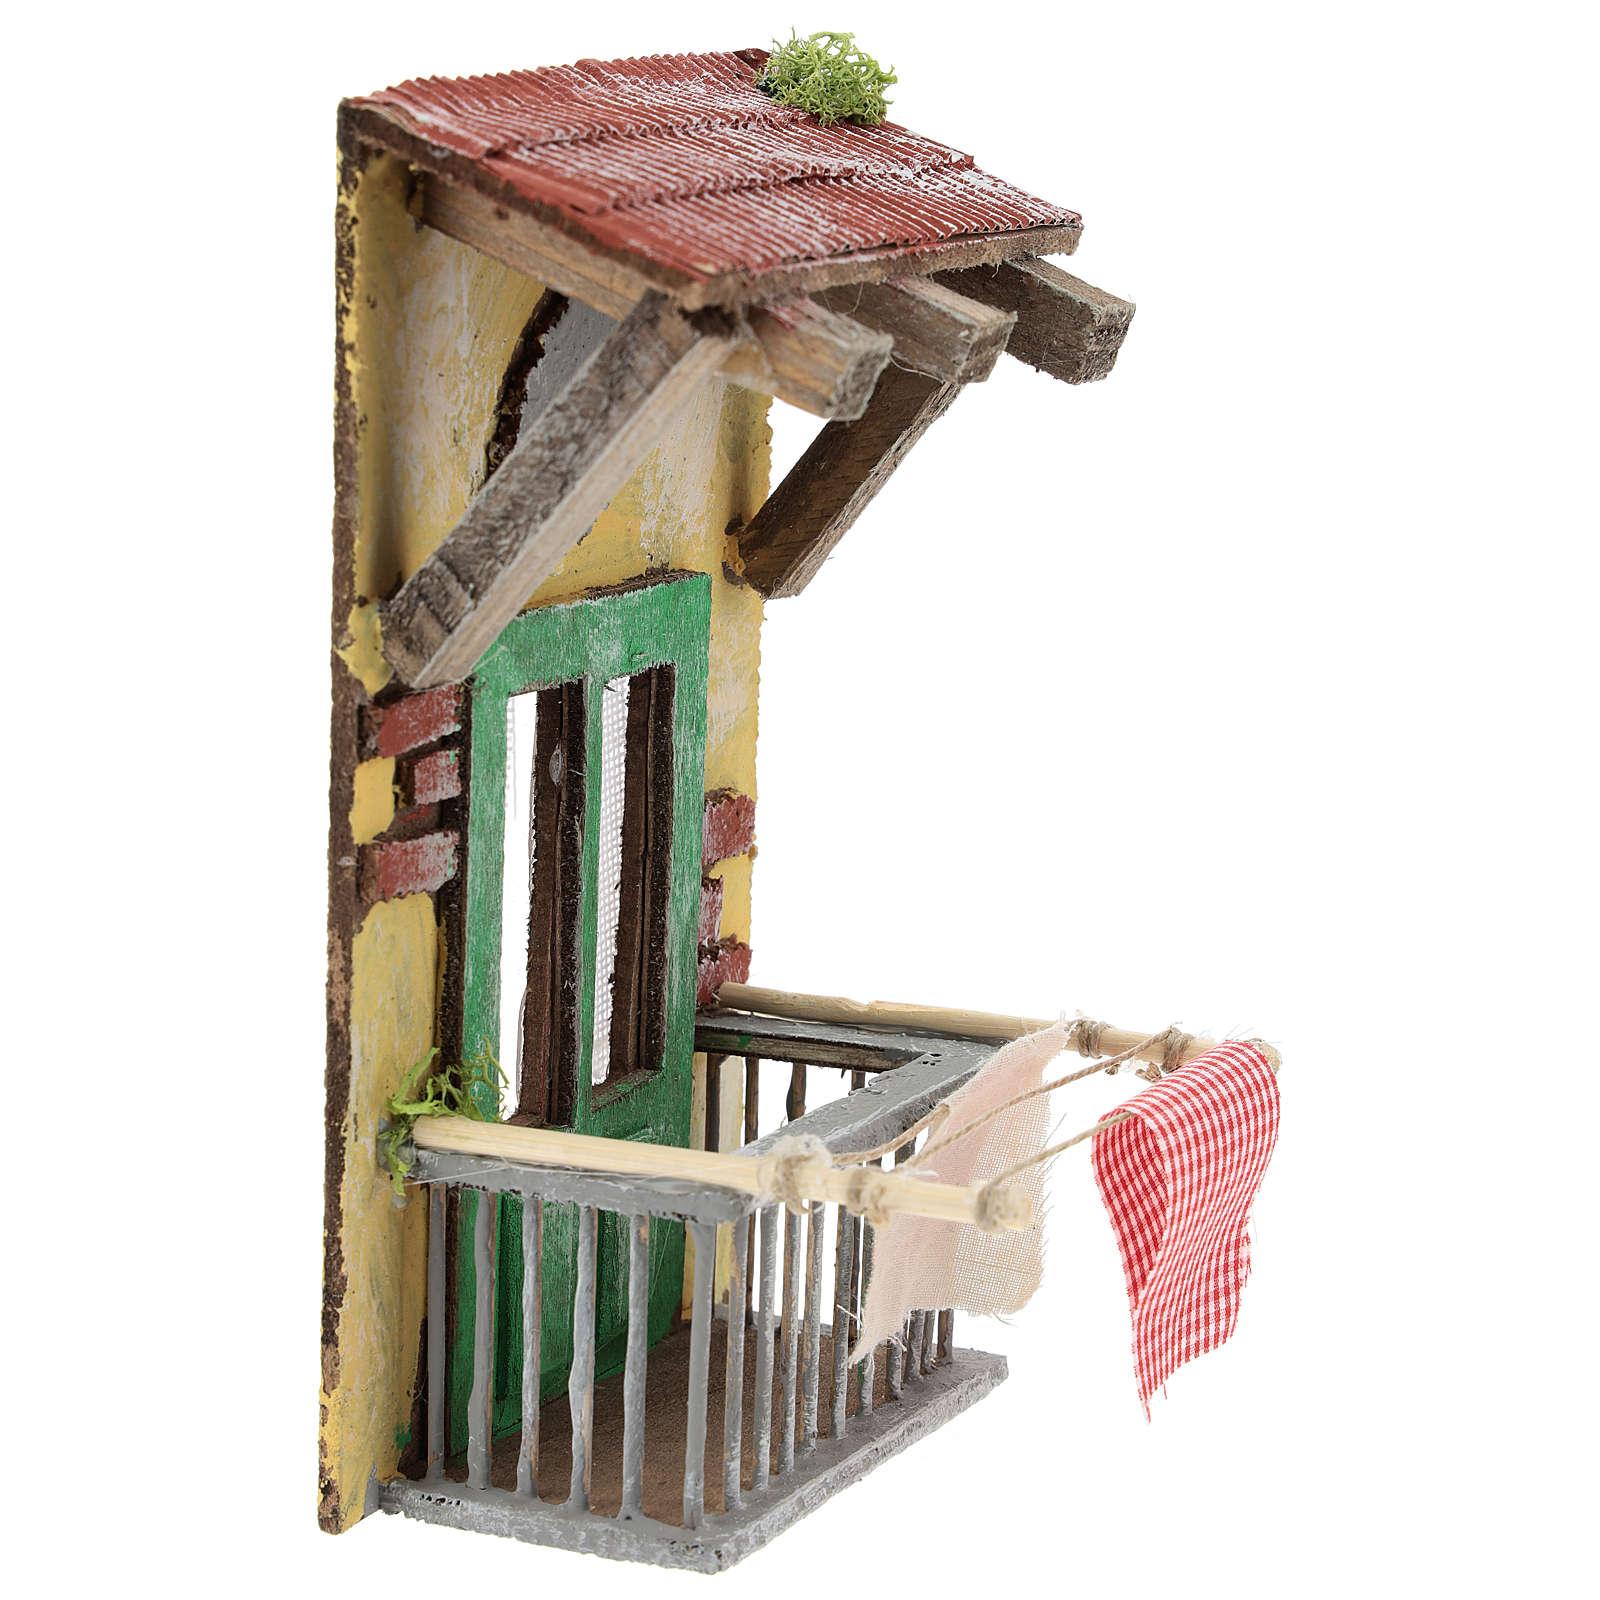 Balcony with canopy for Neapolitan Nativity scene of 12cm 4